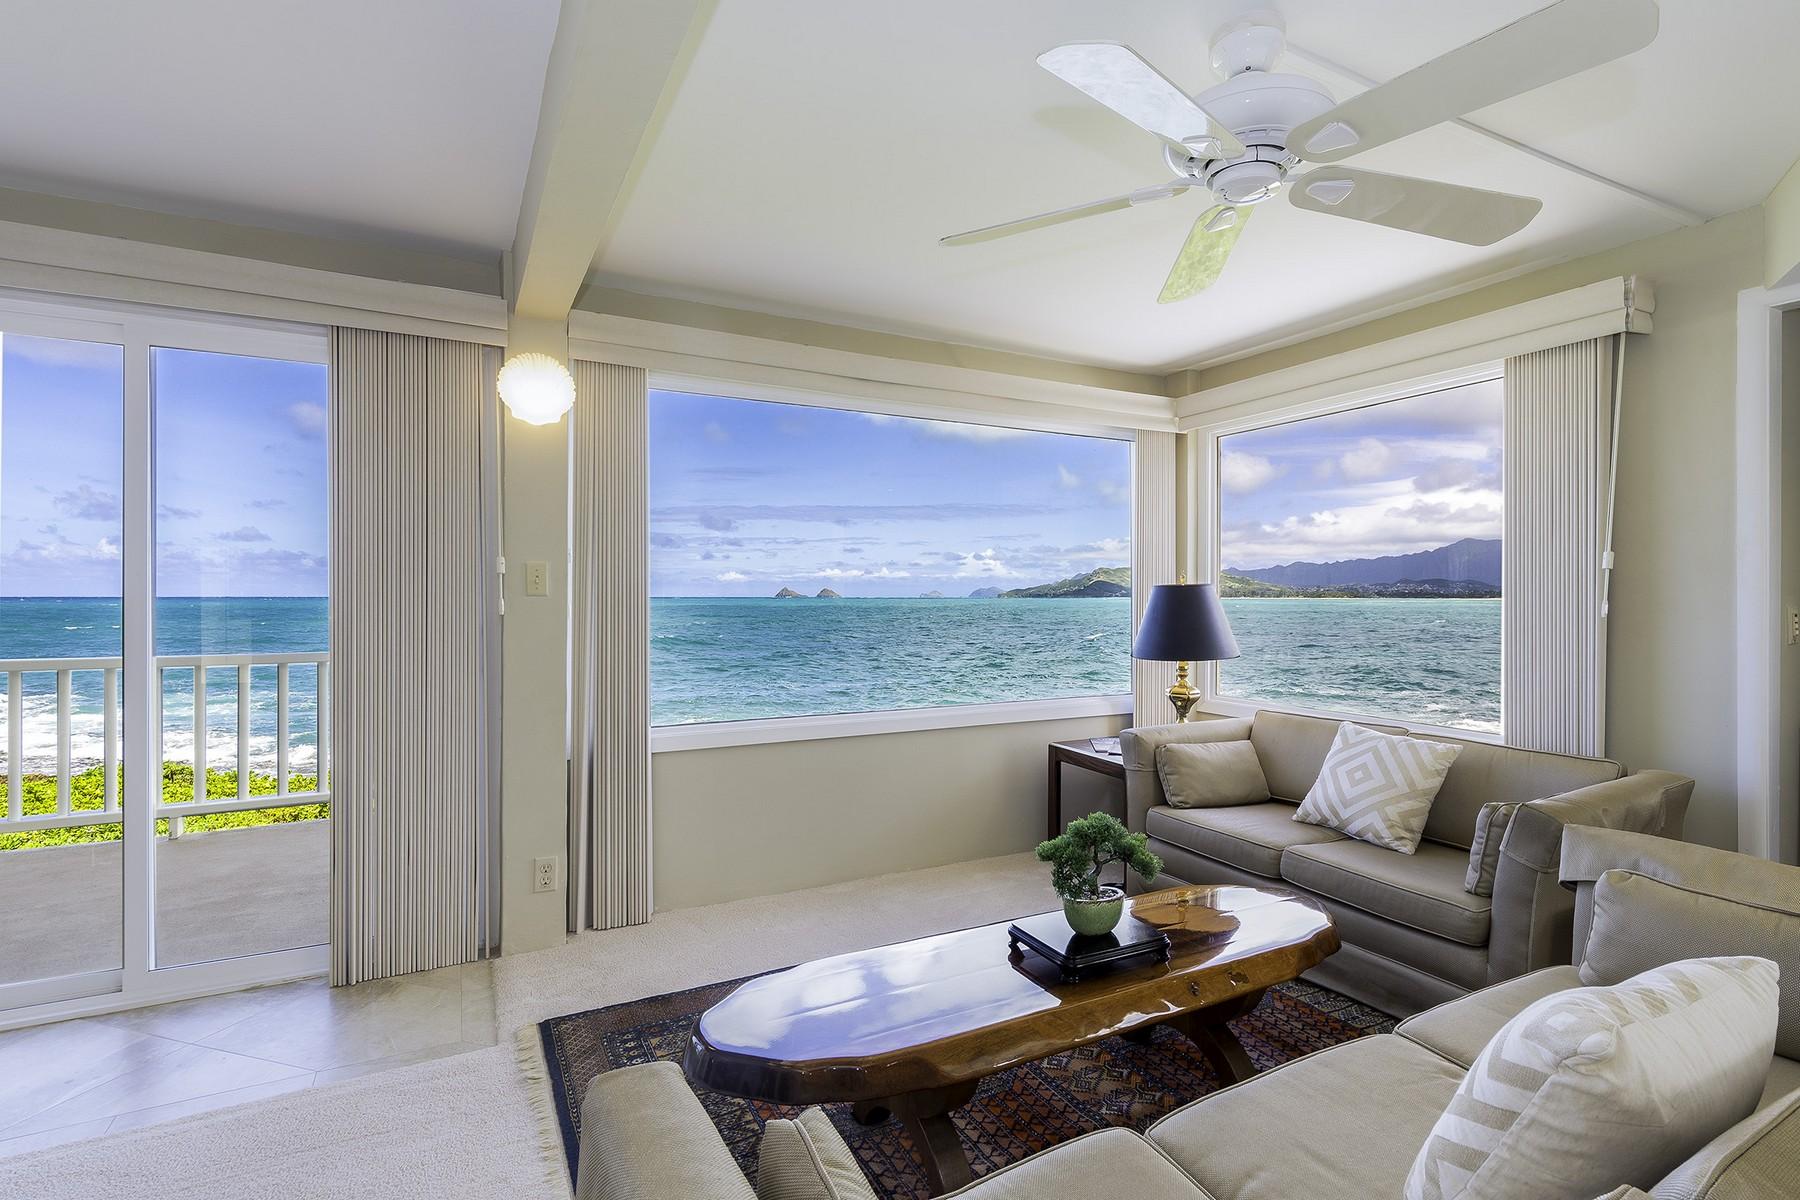 Single Family Home for Sale at Oceanfront Residence in Kaimalino 596 Kaimalino St Kailua, Hawaii, 96734 United States